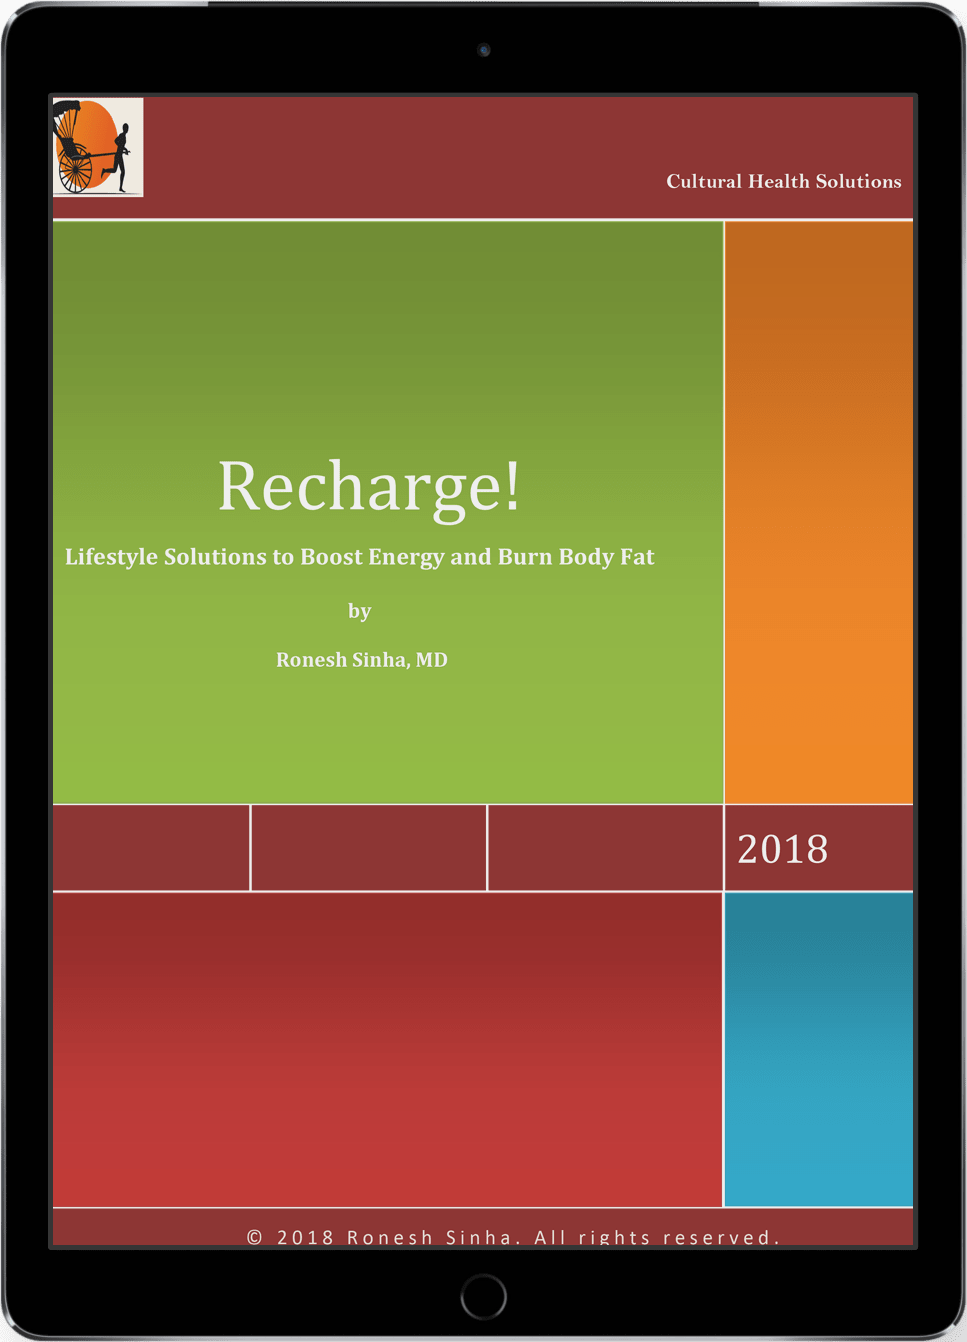 Recharge eBook on an iPad